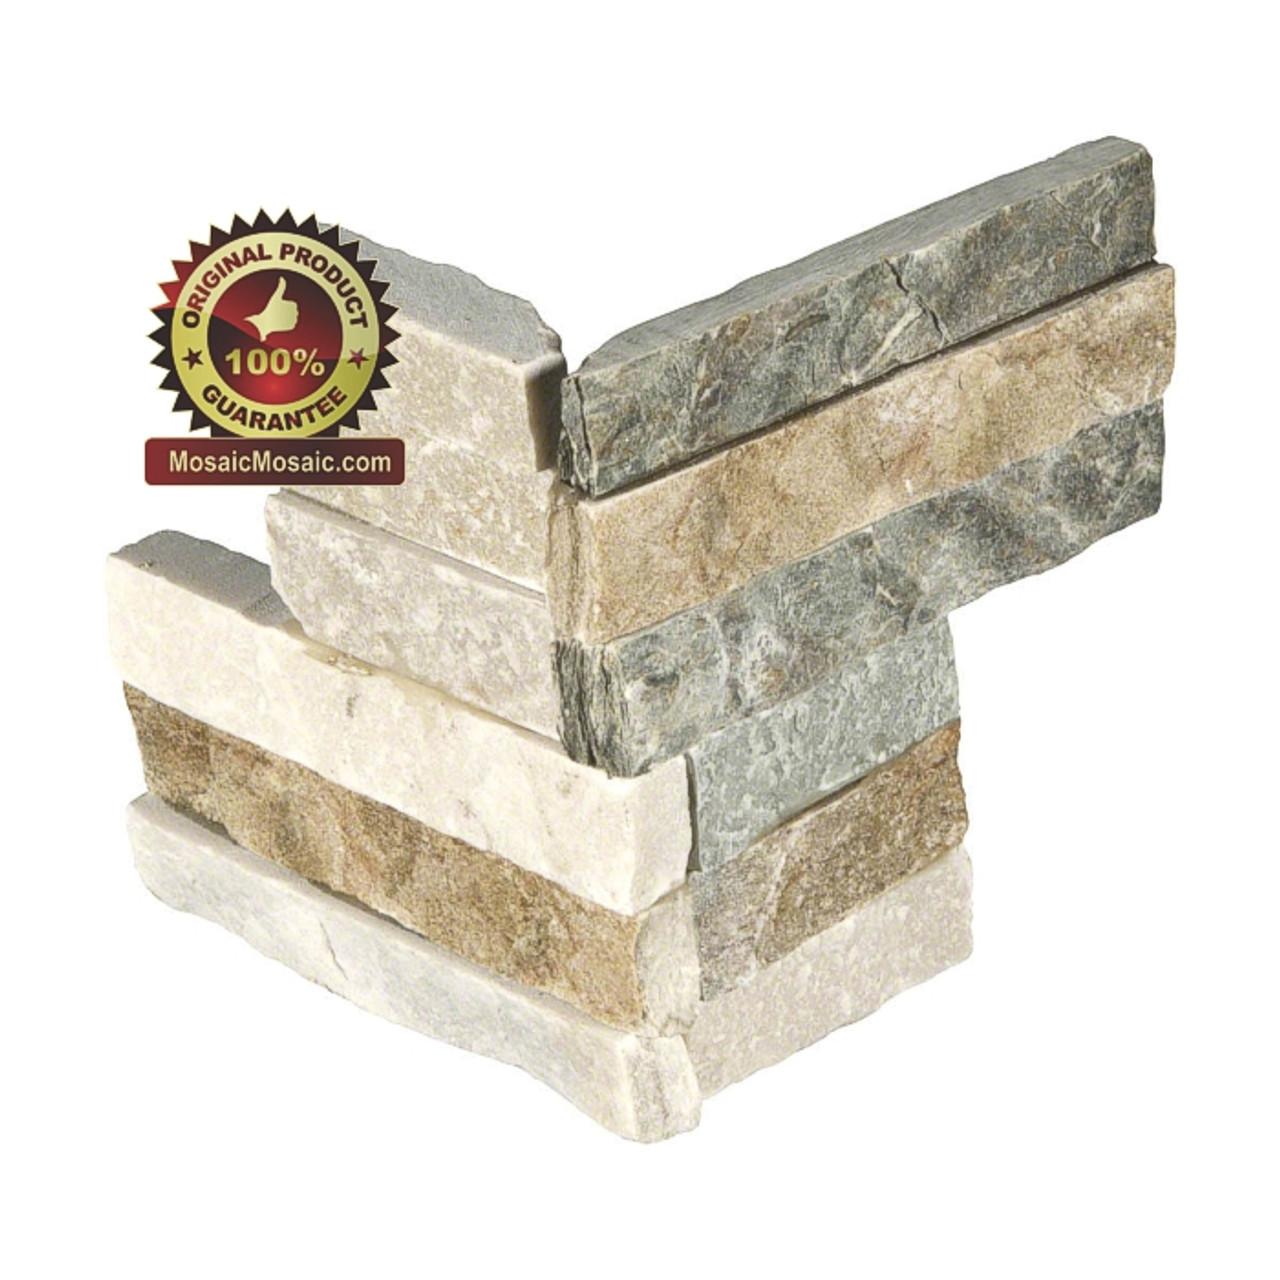 ms international golden honey ledger corner 6 x 18 natural slate wall tile lpnlqgldhon618cor